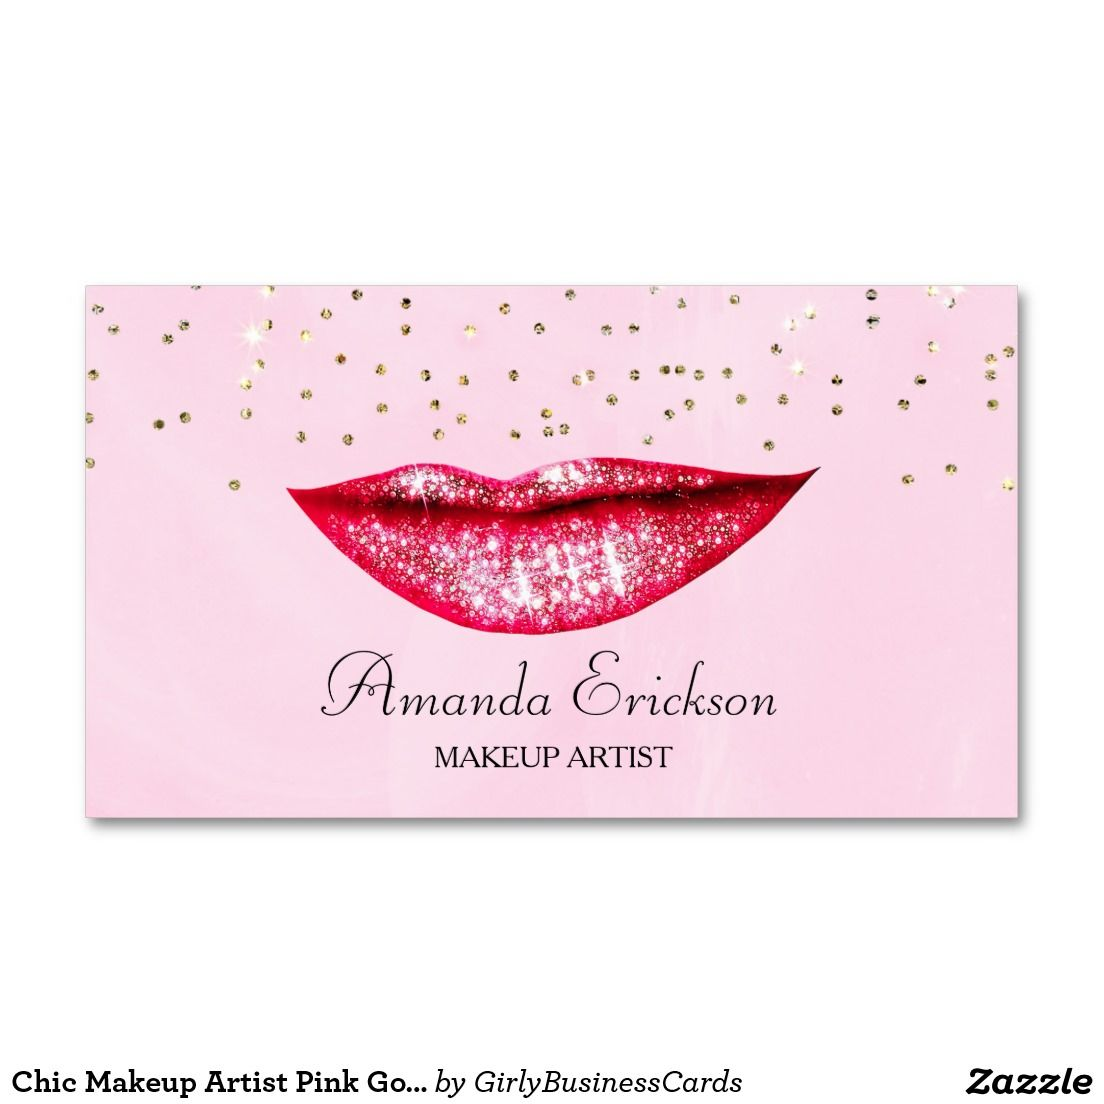 Chic Makeup Artist Pink Gold Faux Diamond Bling Business Card | Business